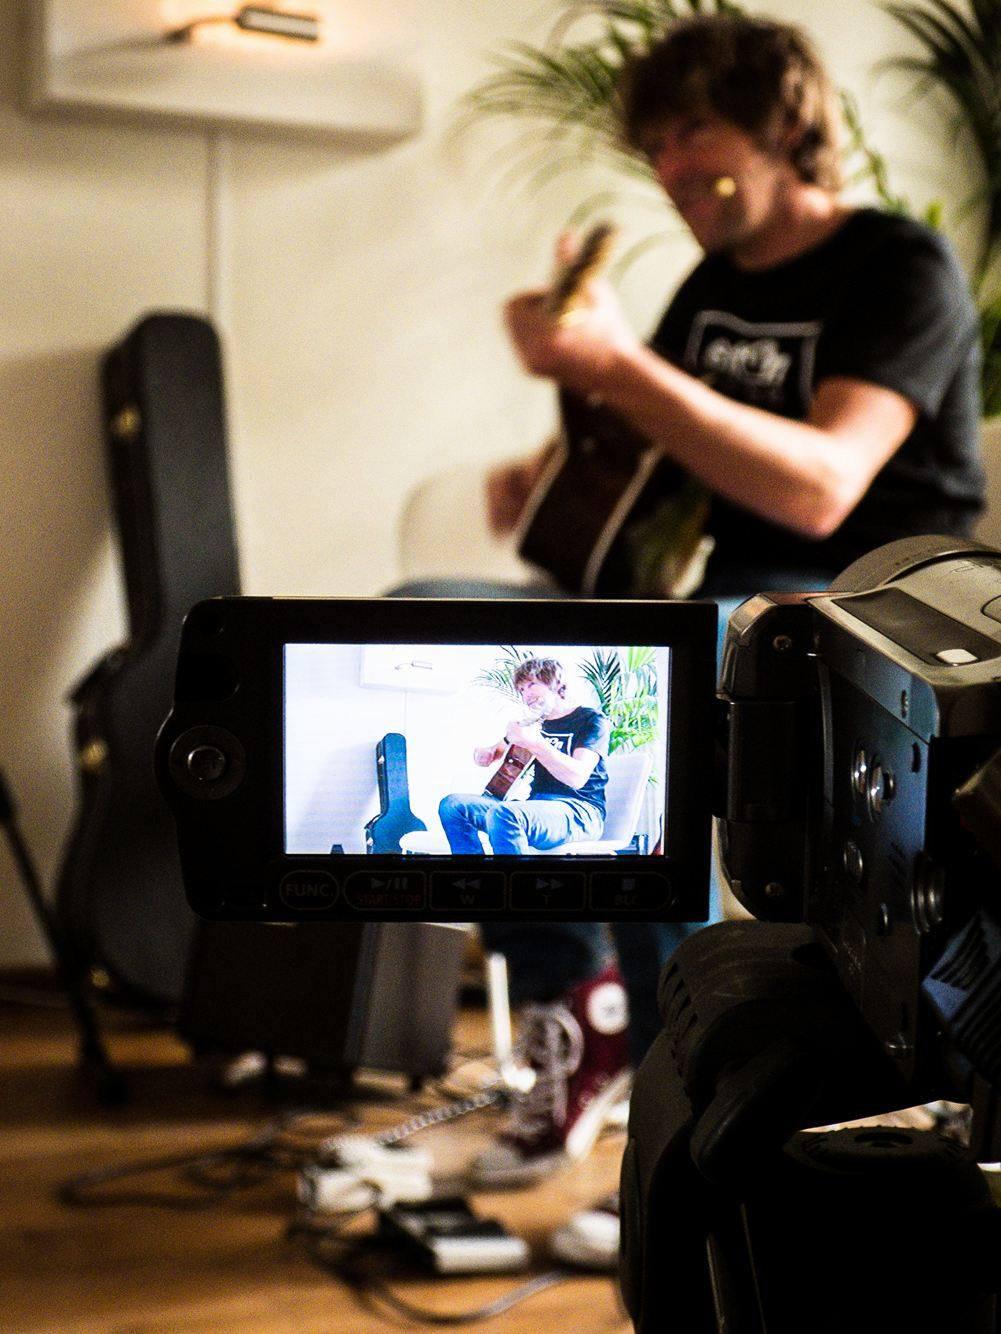 Online living room concert